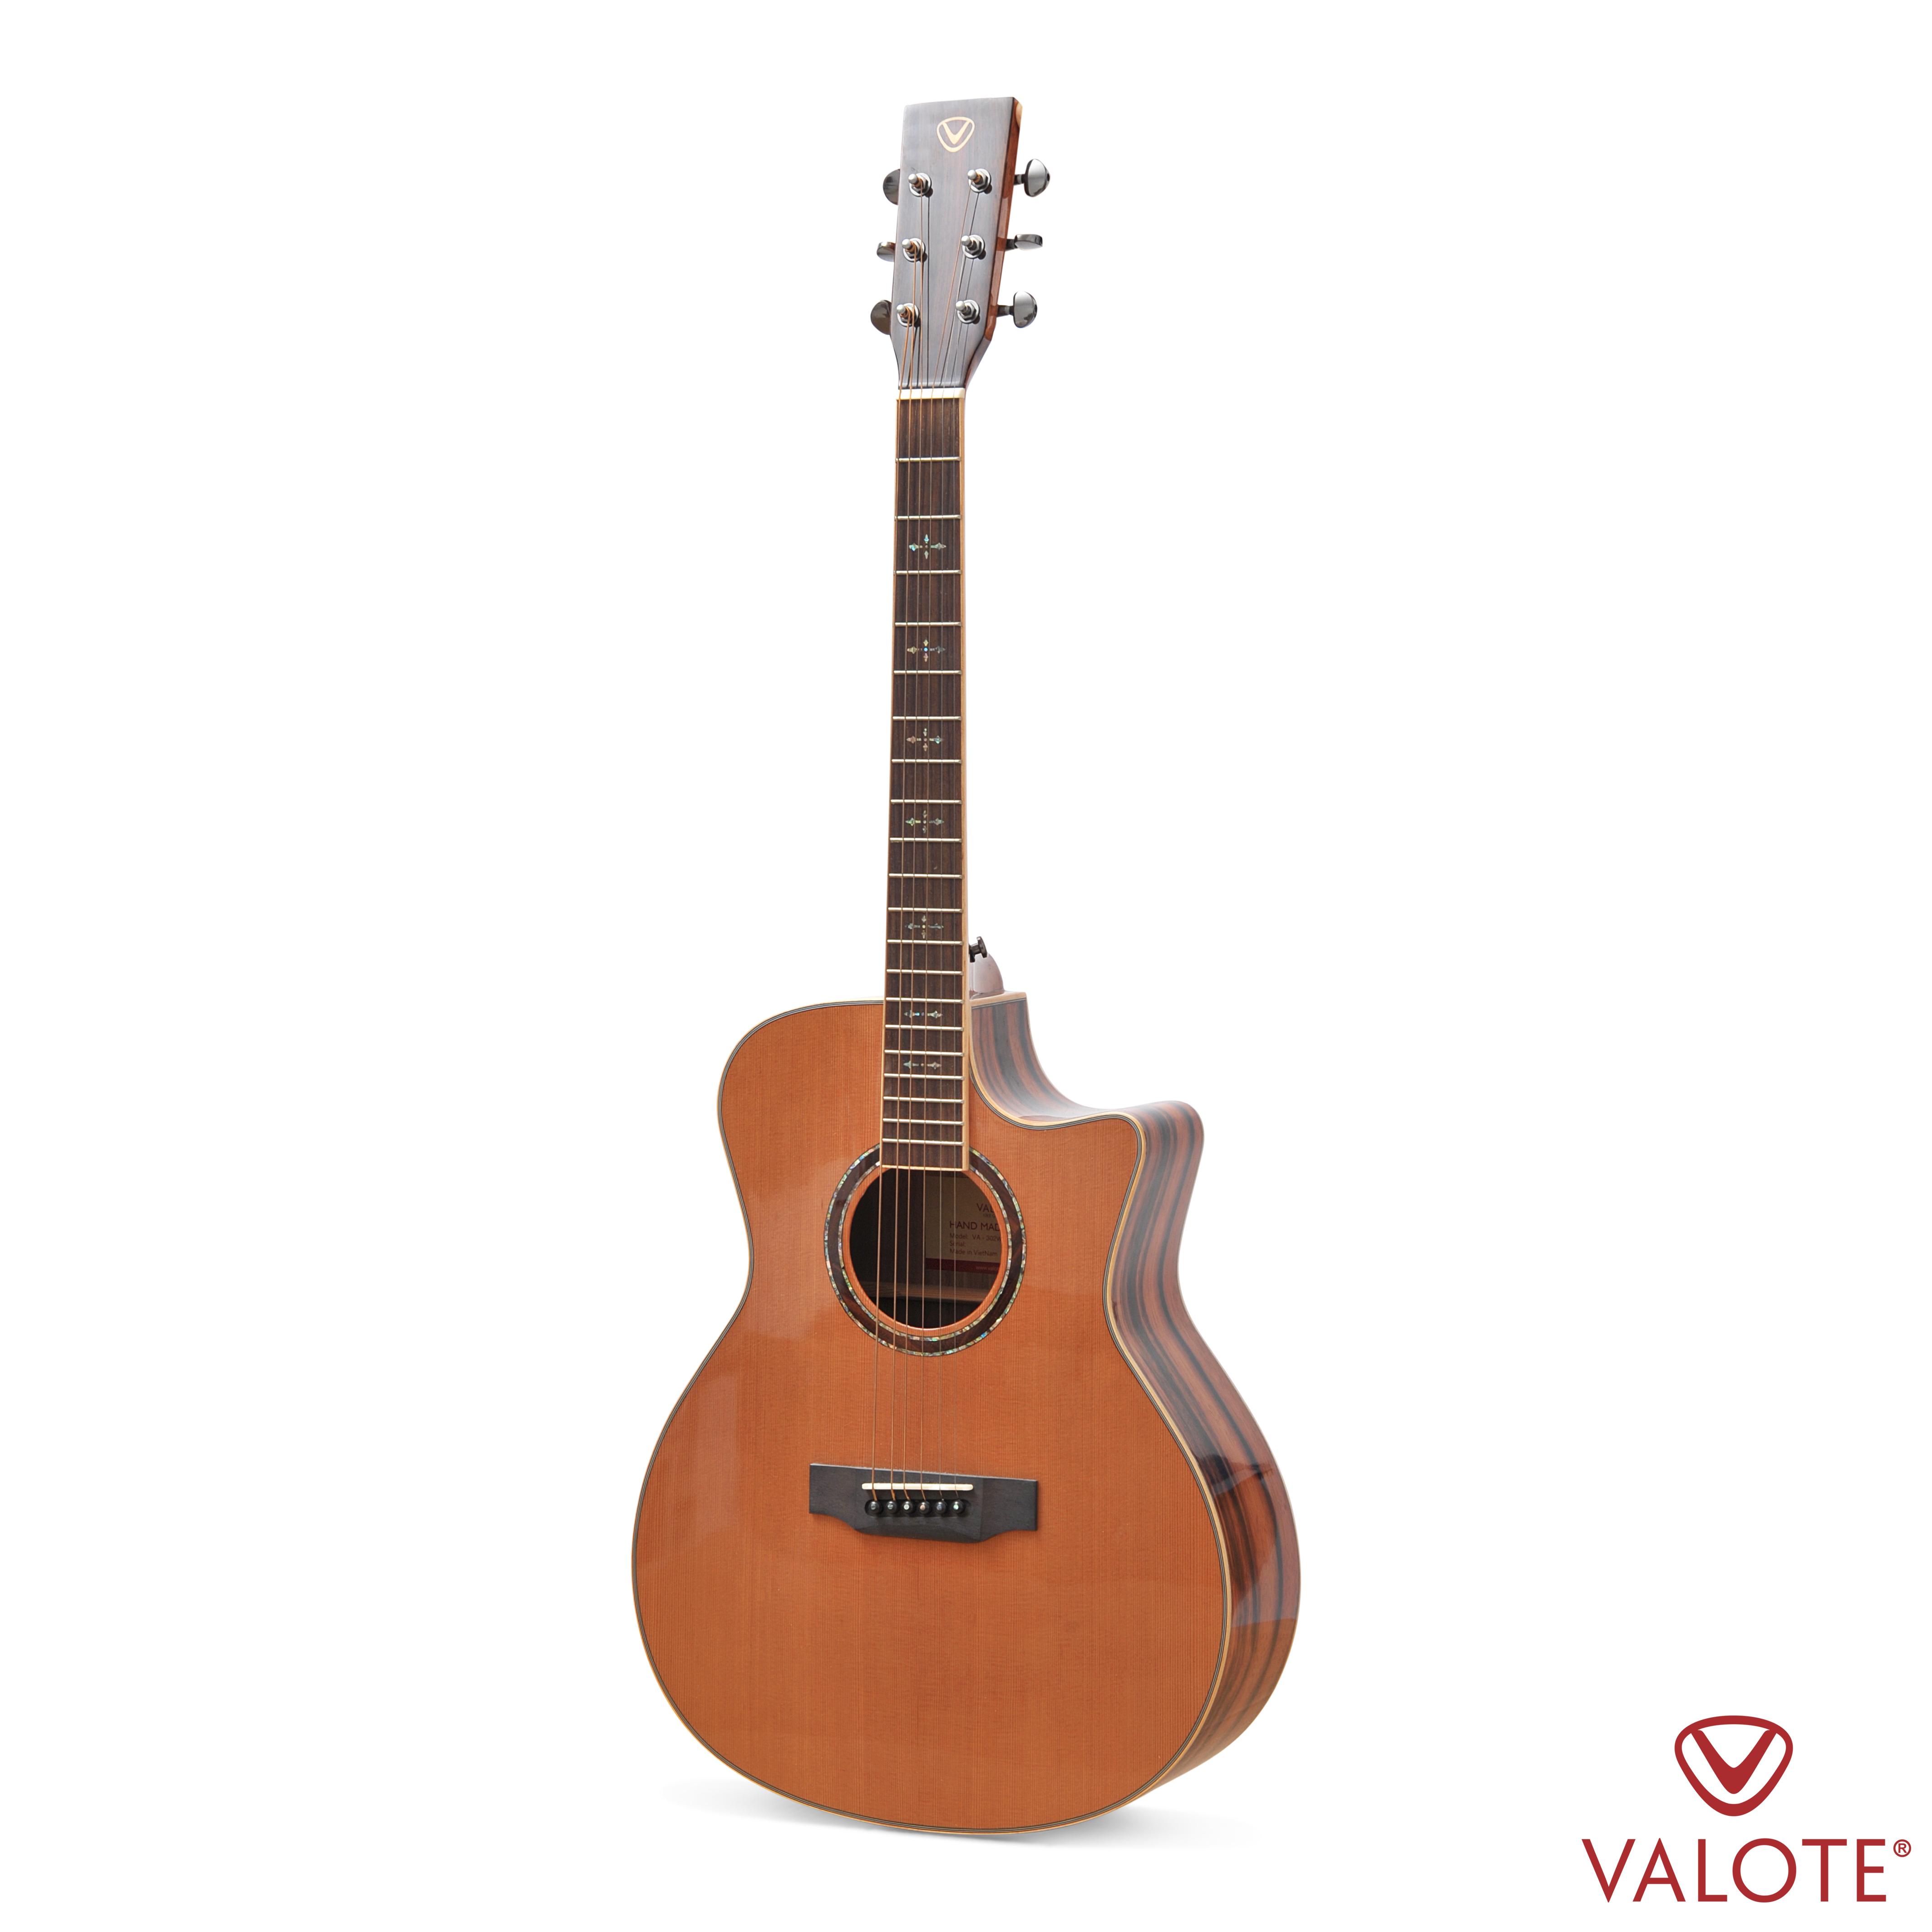 Guitar Acoustic VALOTE VA-302W